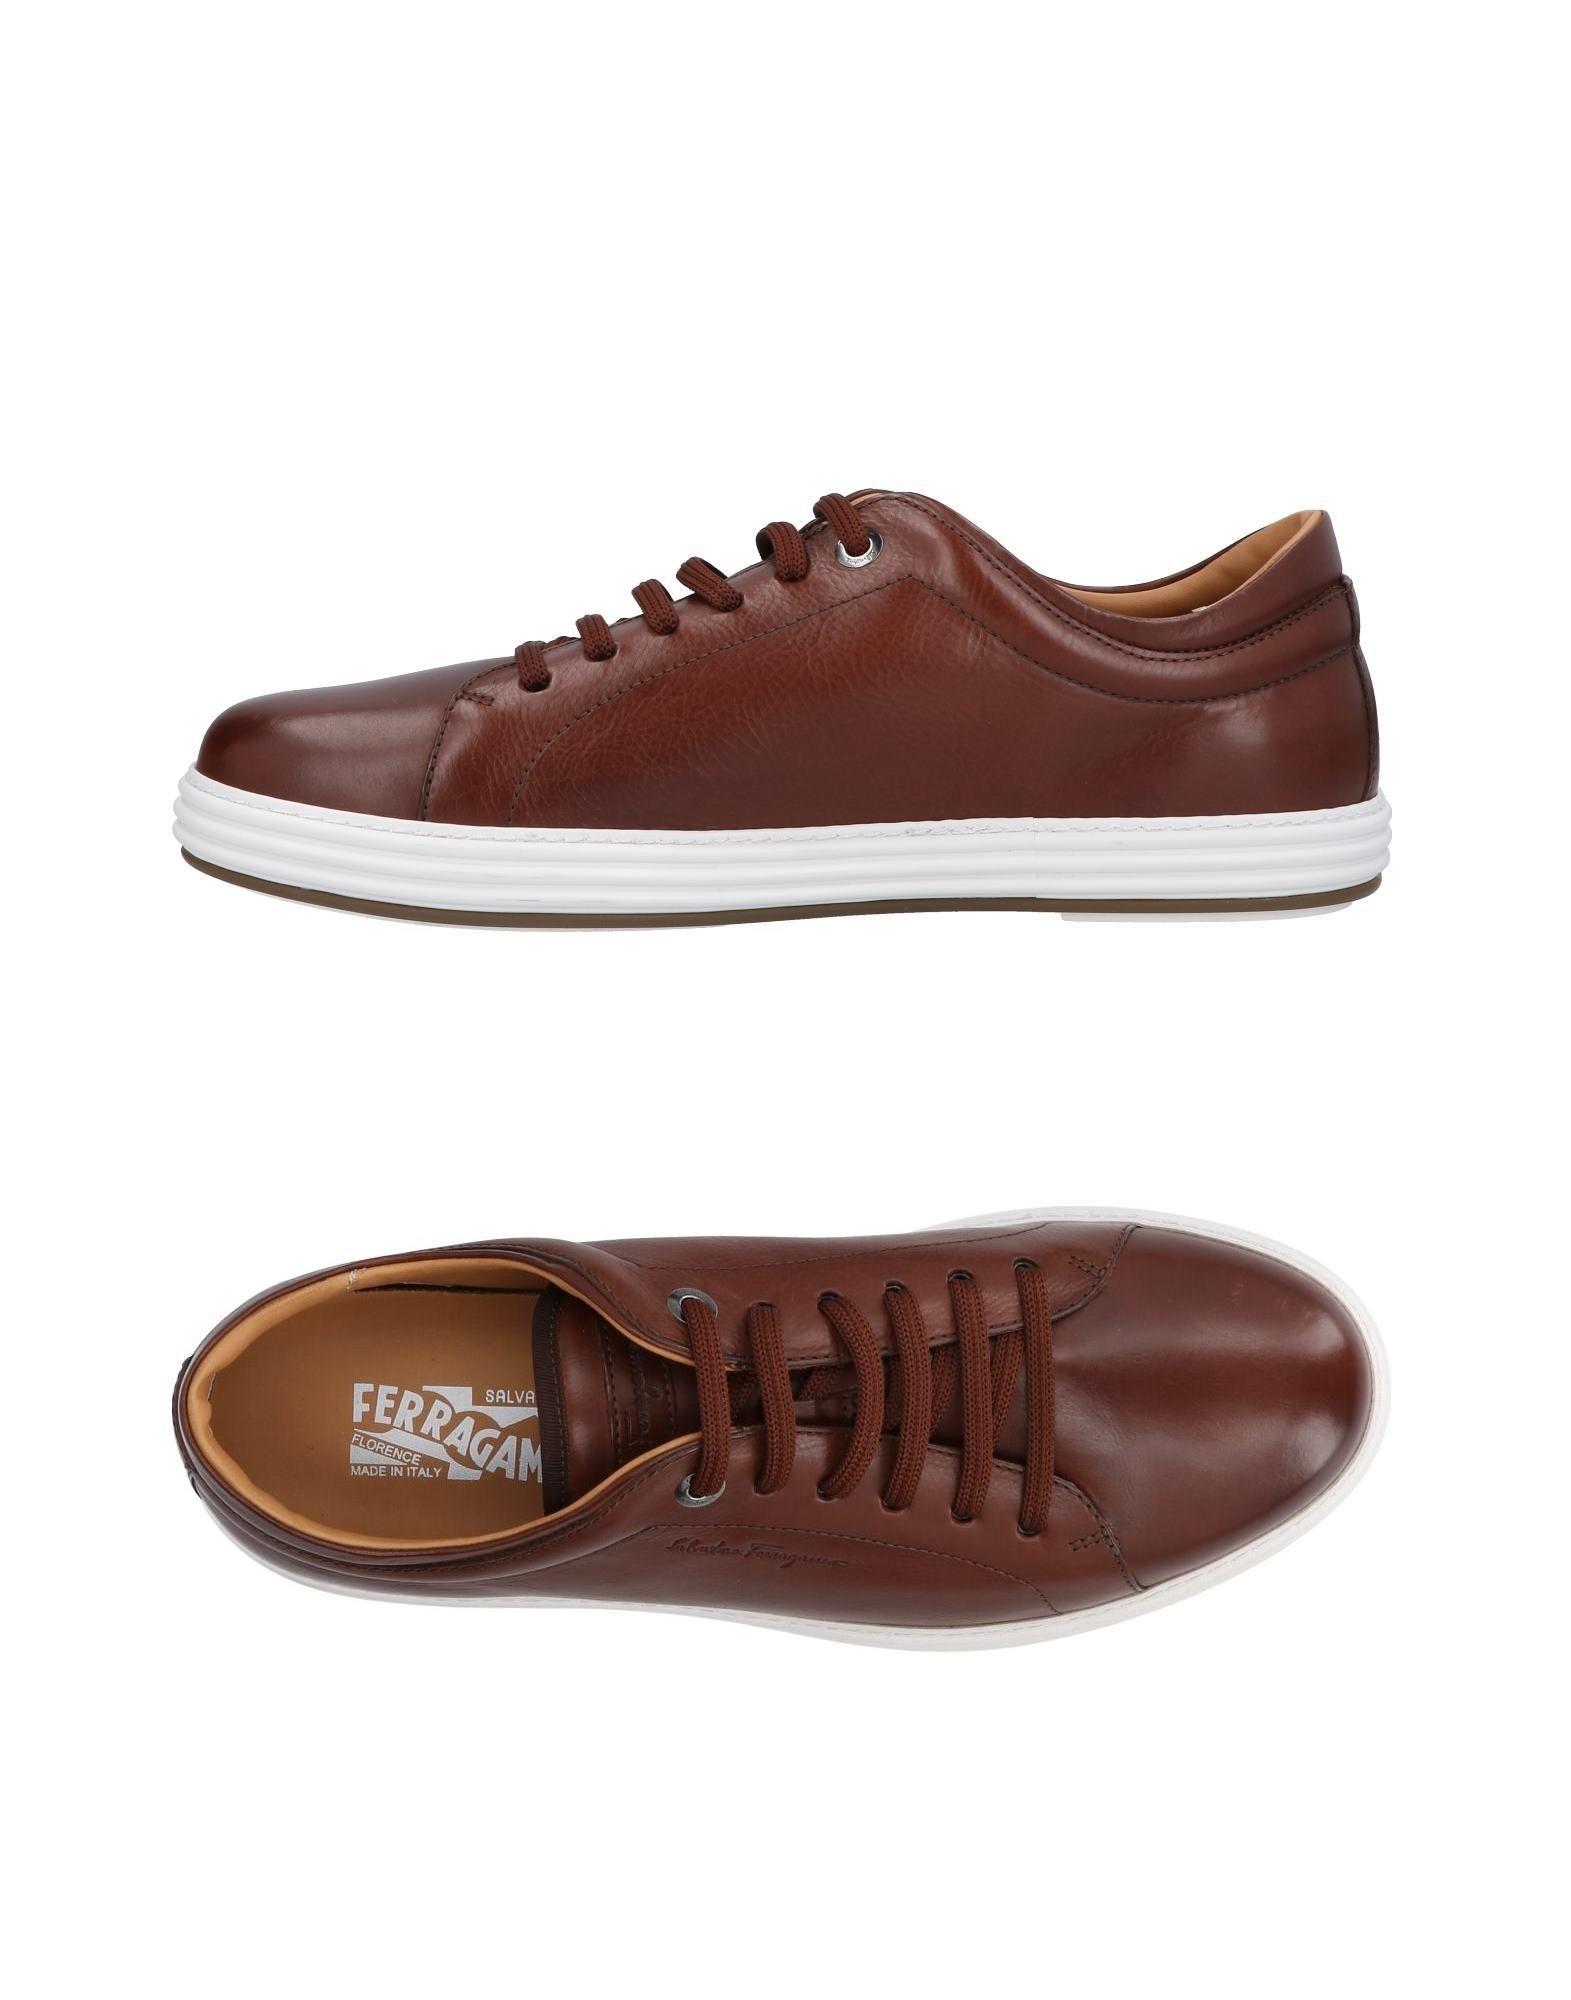 Salvatore Ferragamo Sneakers Herren  11465863WU Gute Qualität beliebte Schuhe